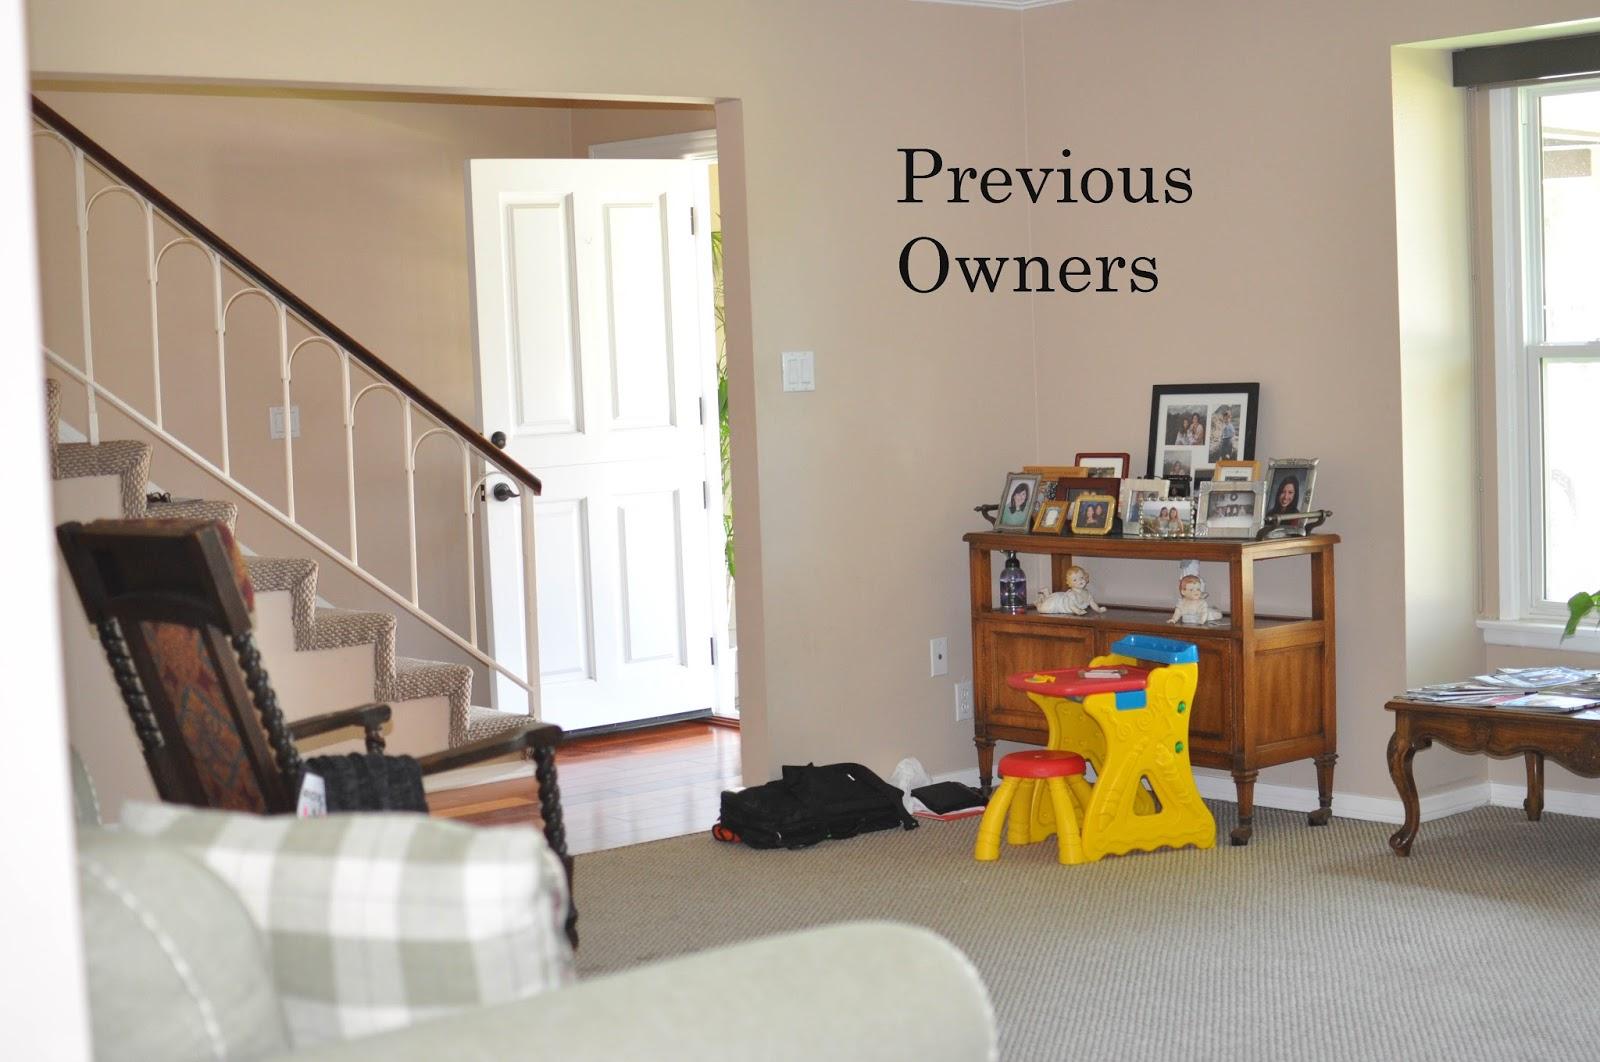 gwen moss my living room update adding built in bookshelves